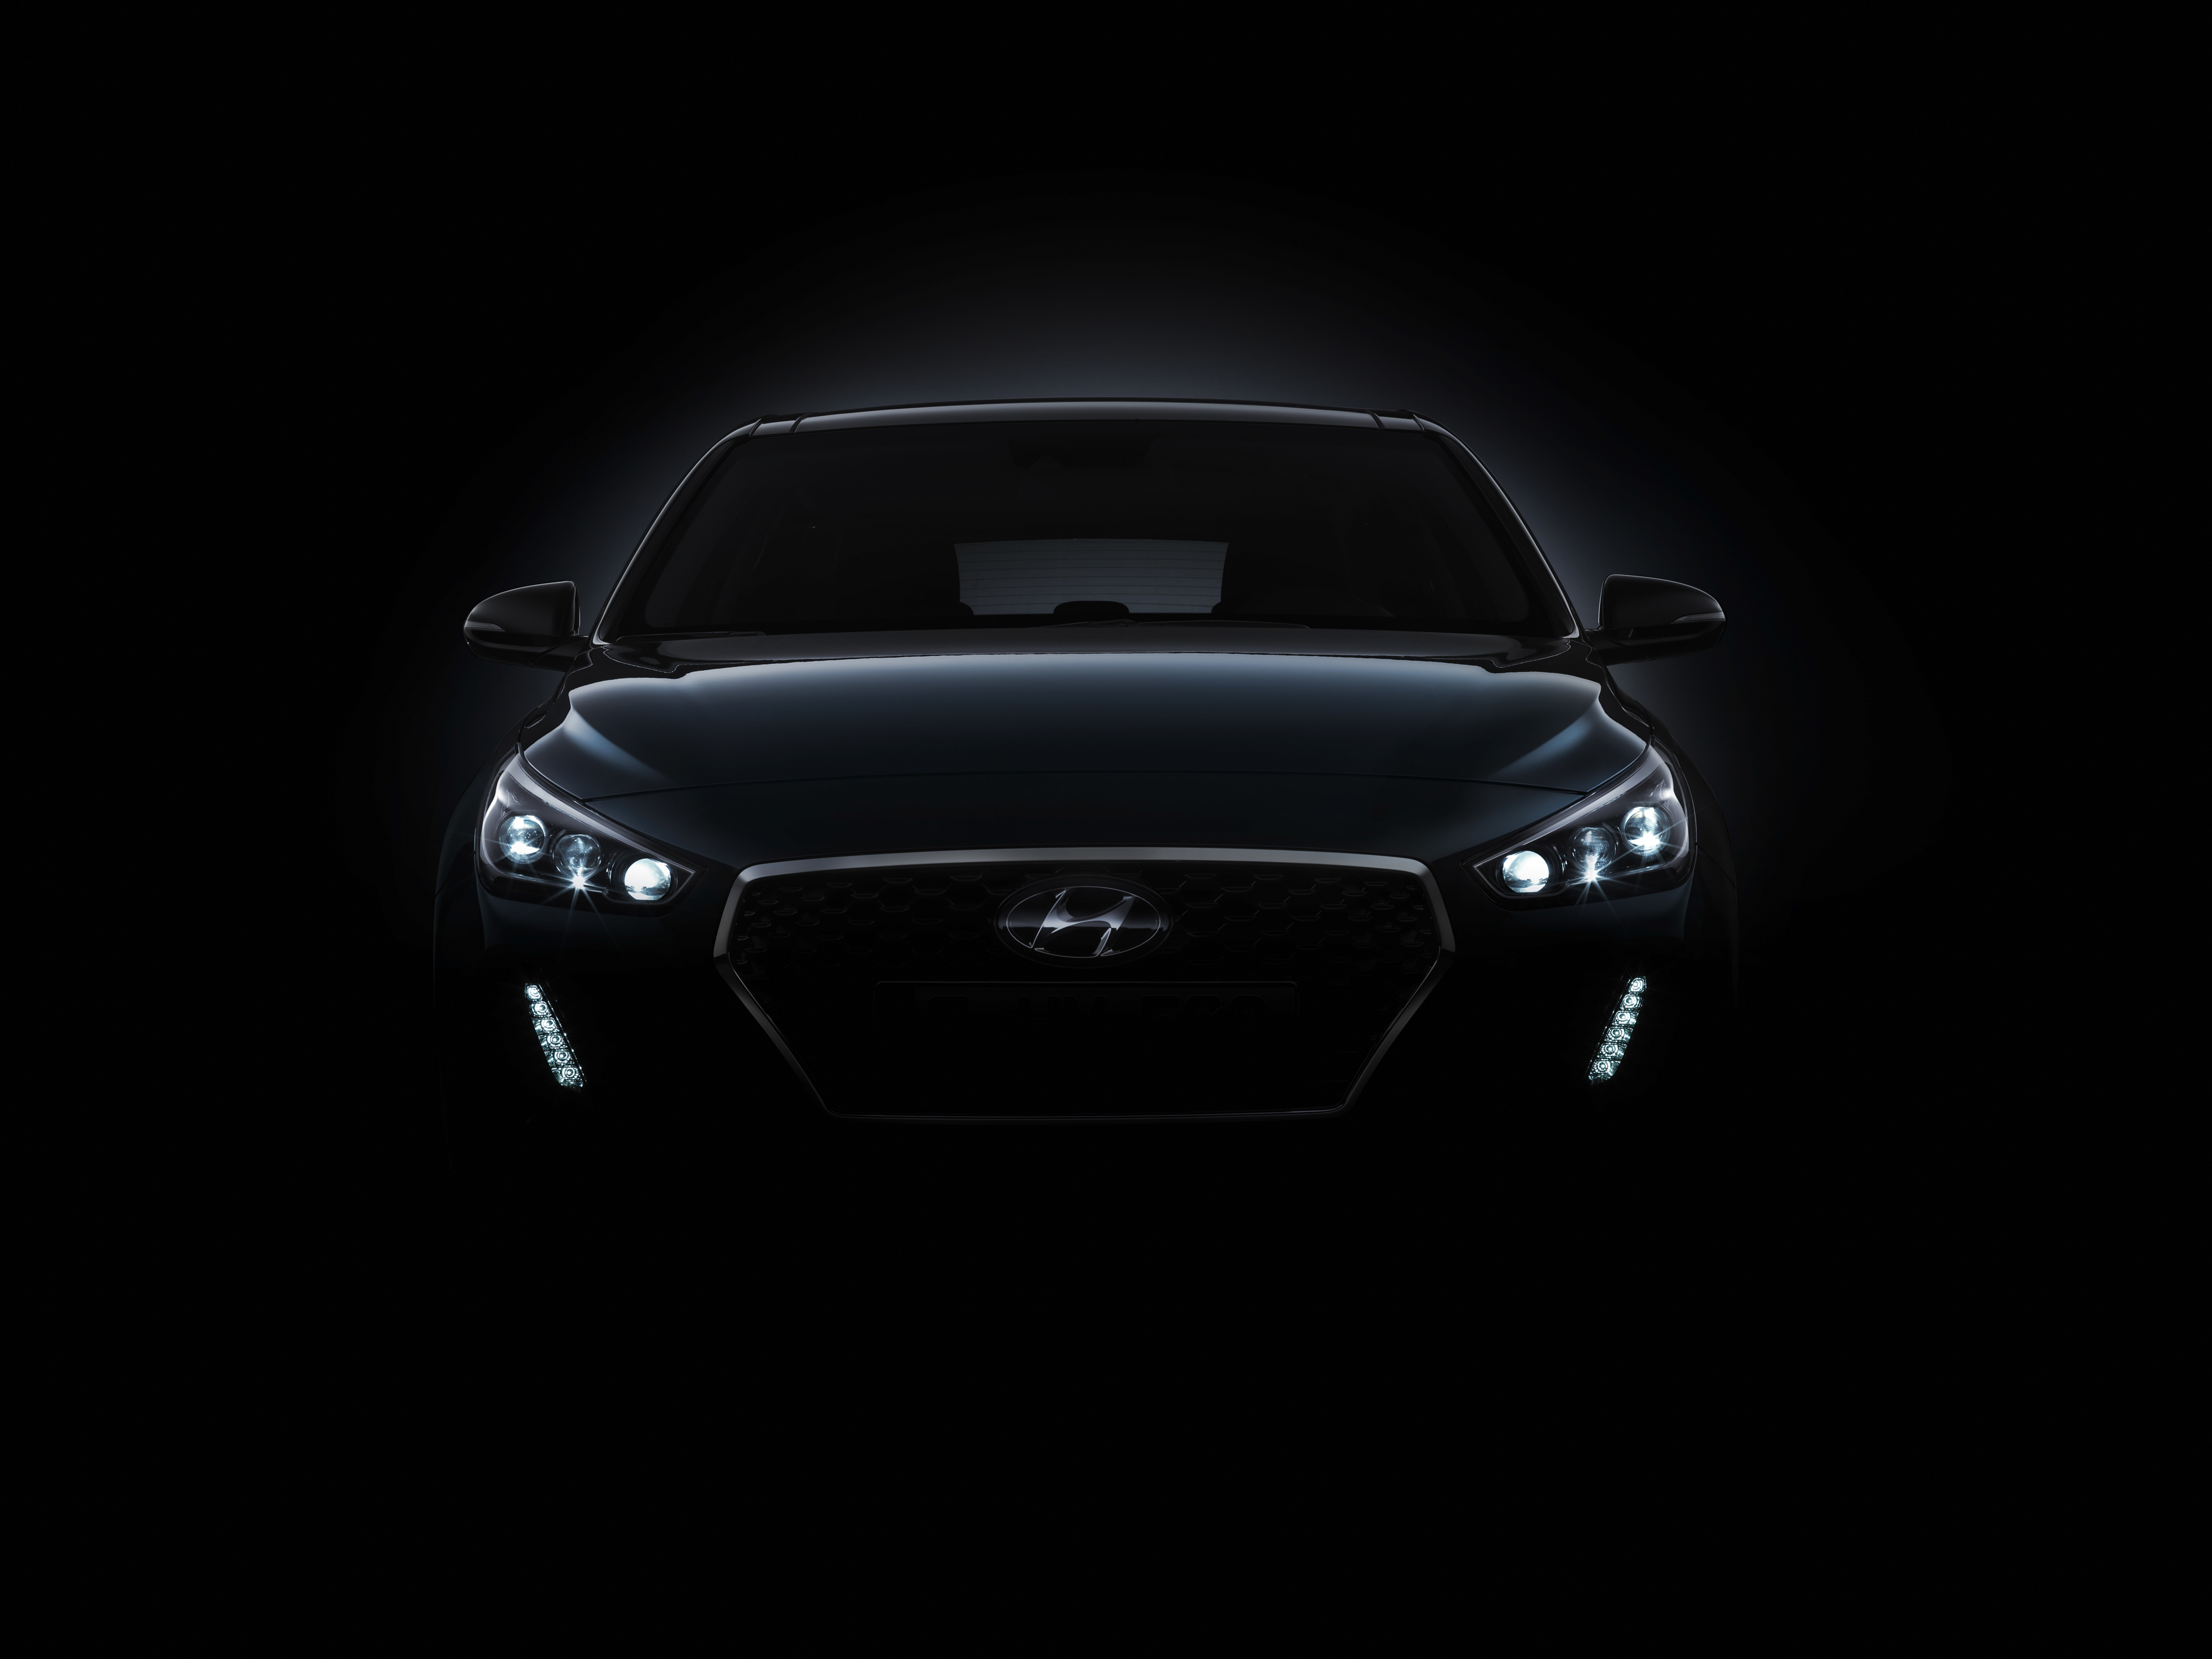 Hyundai Motor unveils first details of the New Generation Hyundai i30